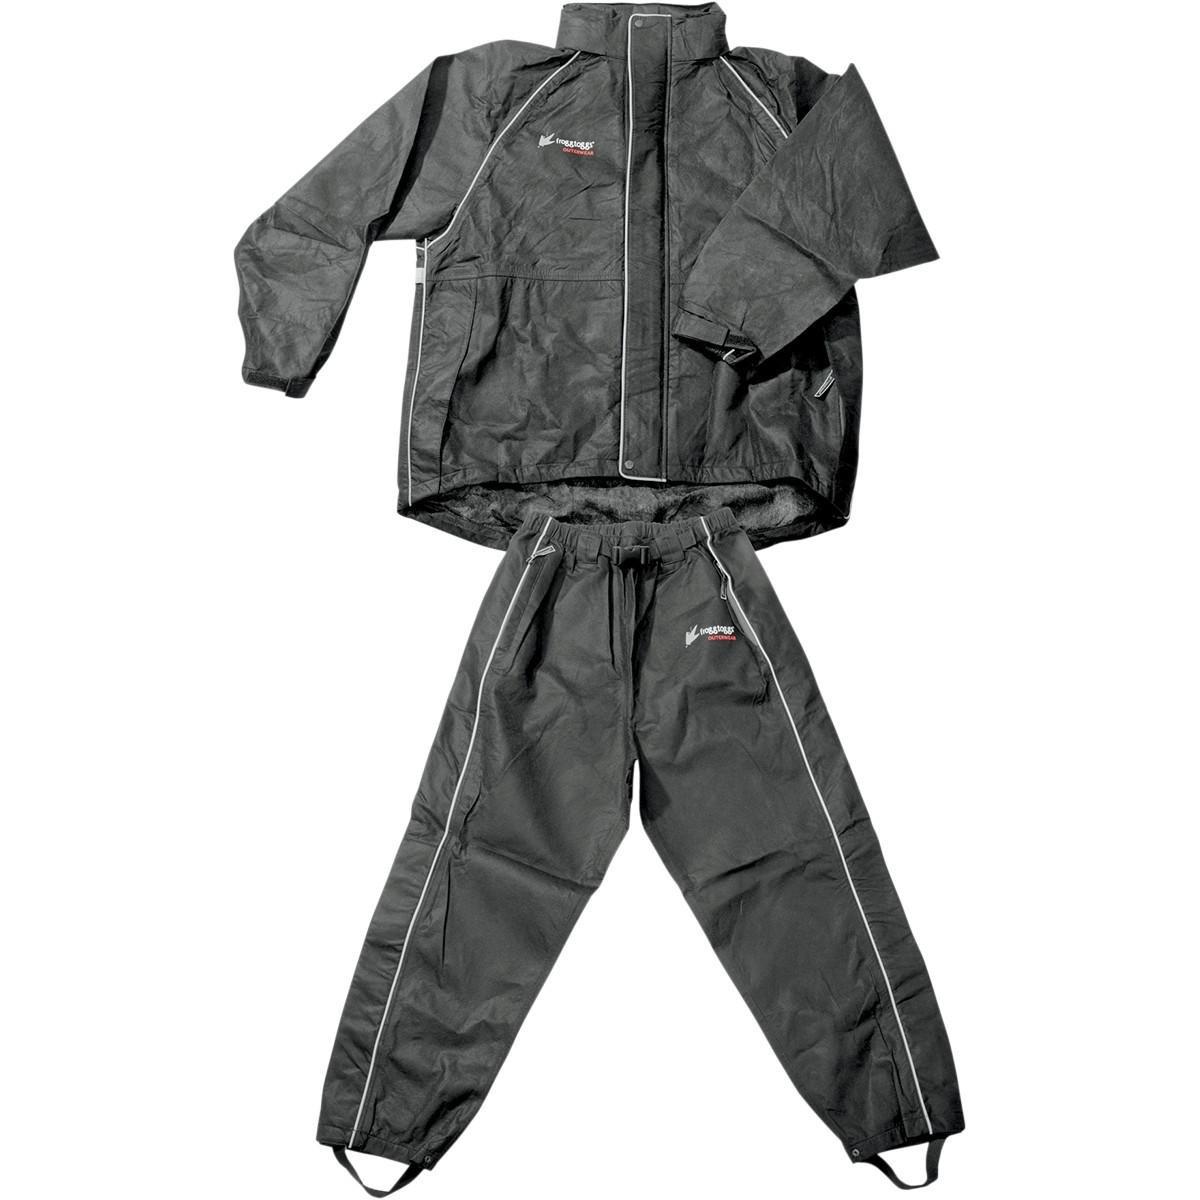 Frogg Toggs Women's Cruisin Toggs Rainsuit (Black, X-Large) - TT10599-01XL